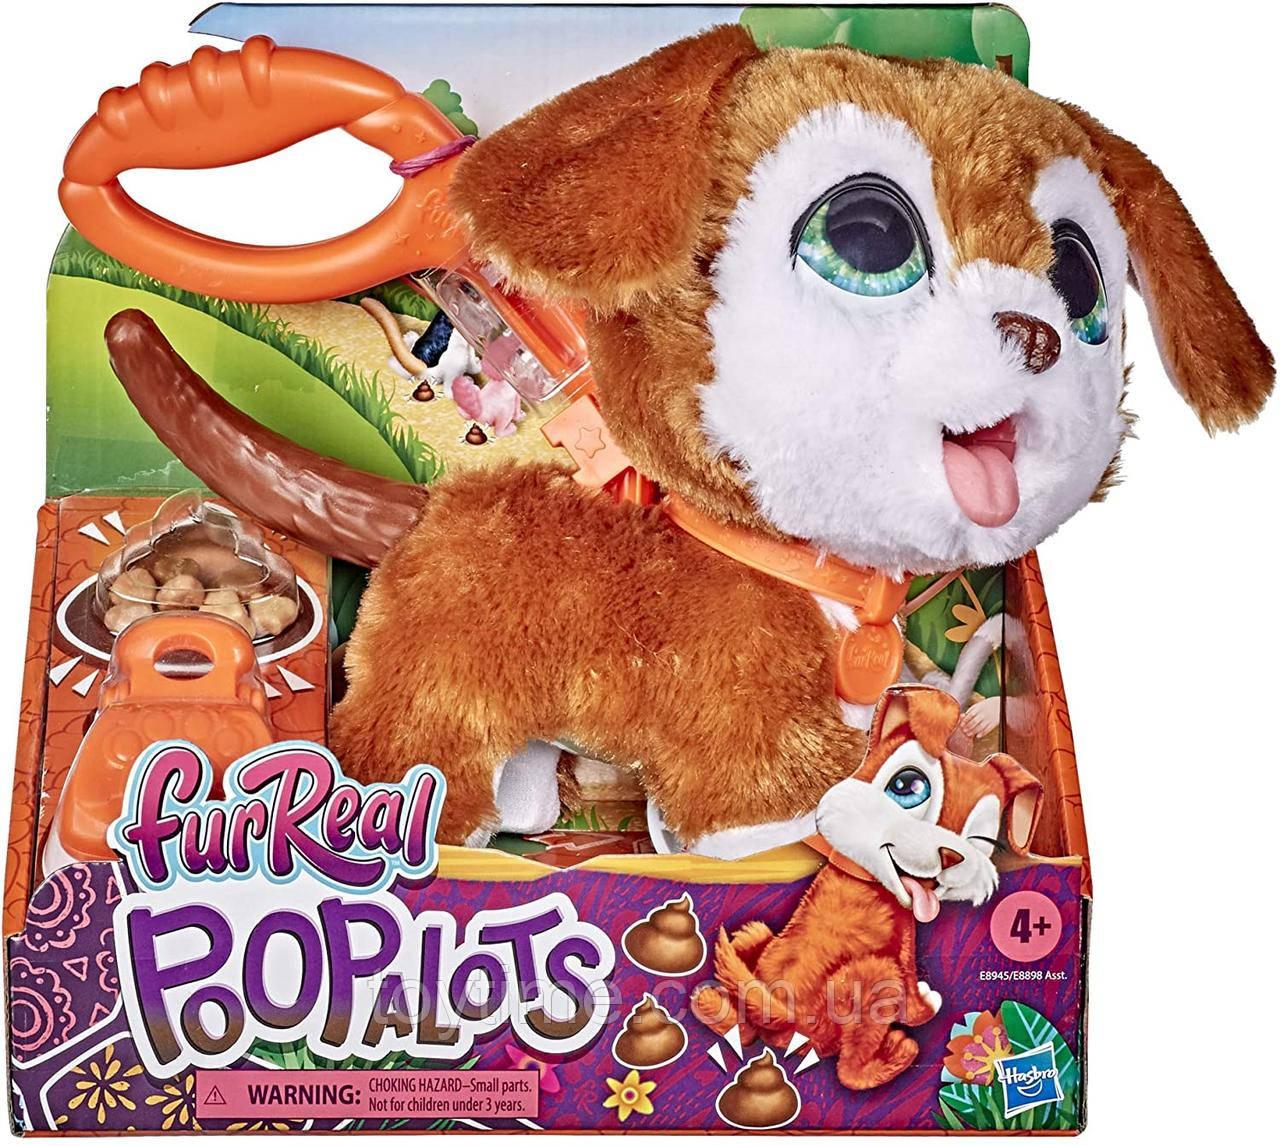 Мягкая игрушка FurReal Friends Шаловливый питомец Большой щенок / FurReal Poopalots Big Wags Interactive Pet